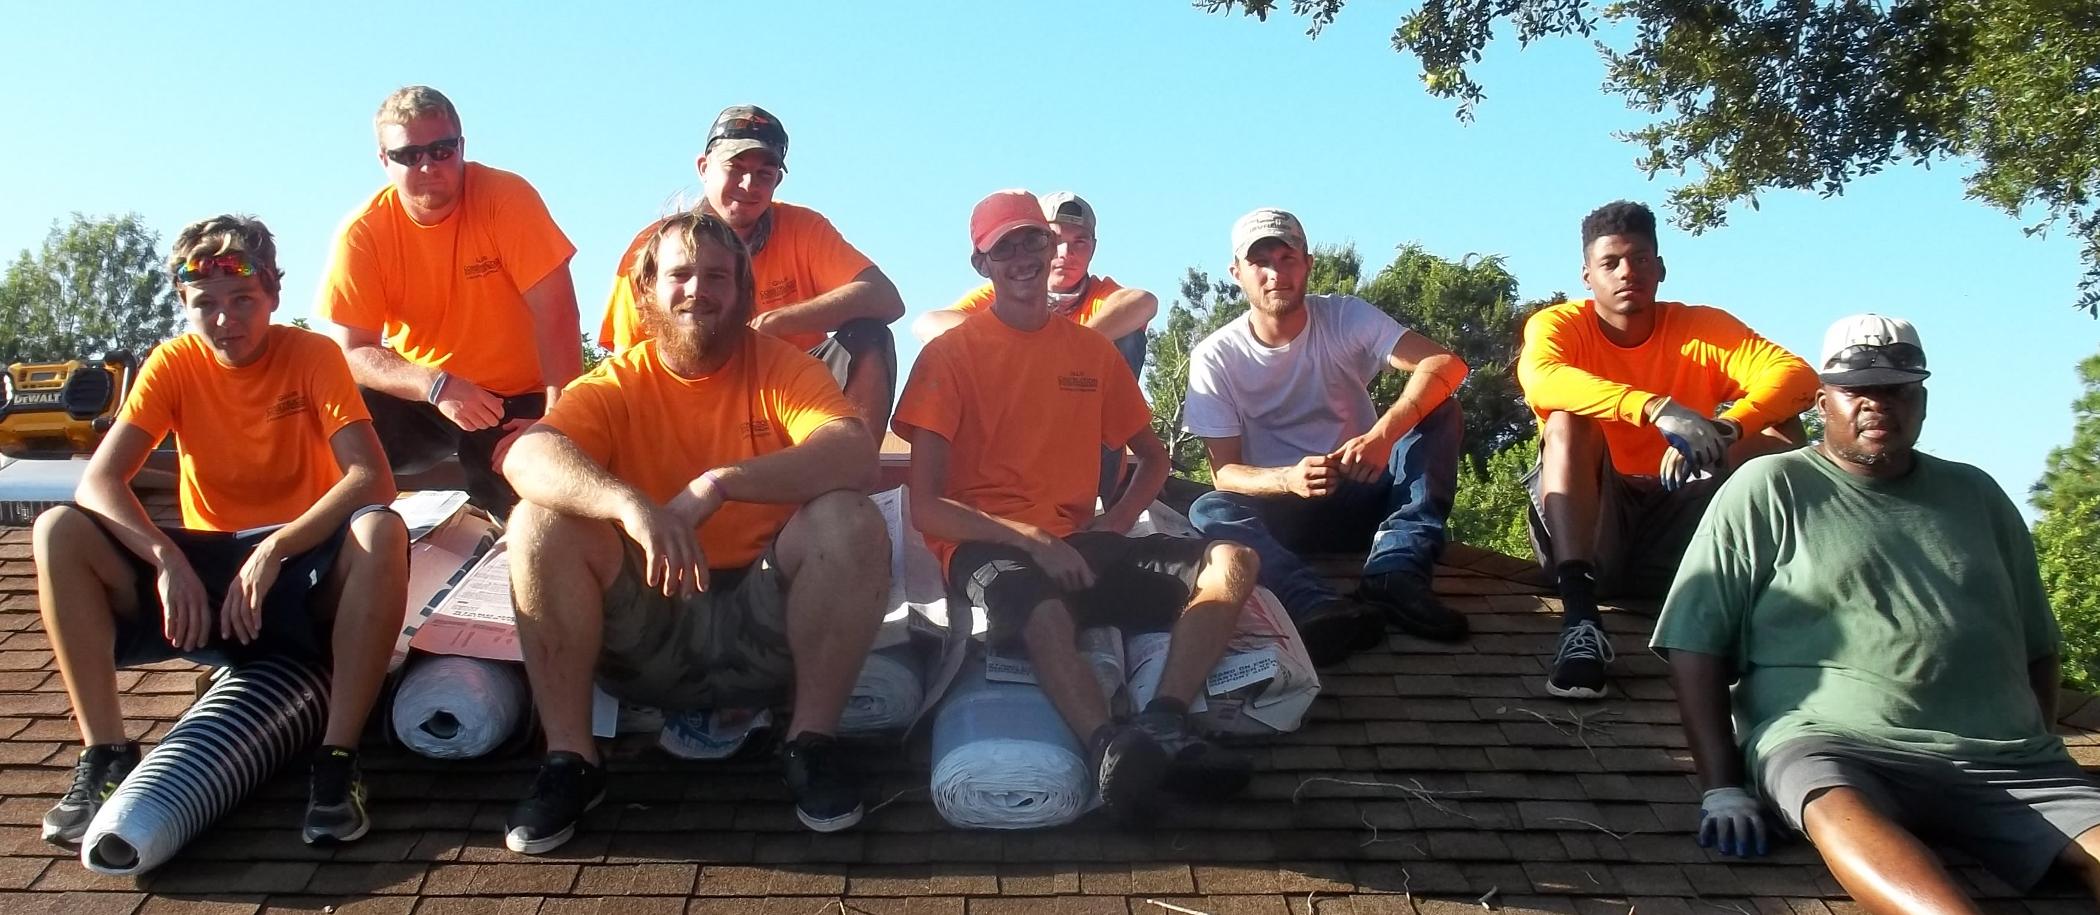 Construction Companies Southwest Florida slide 2